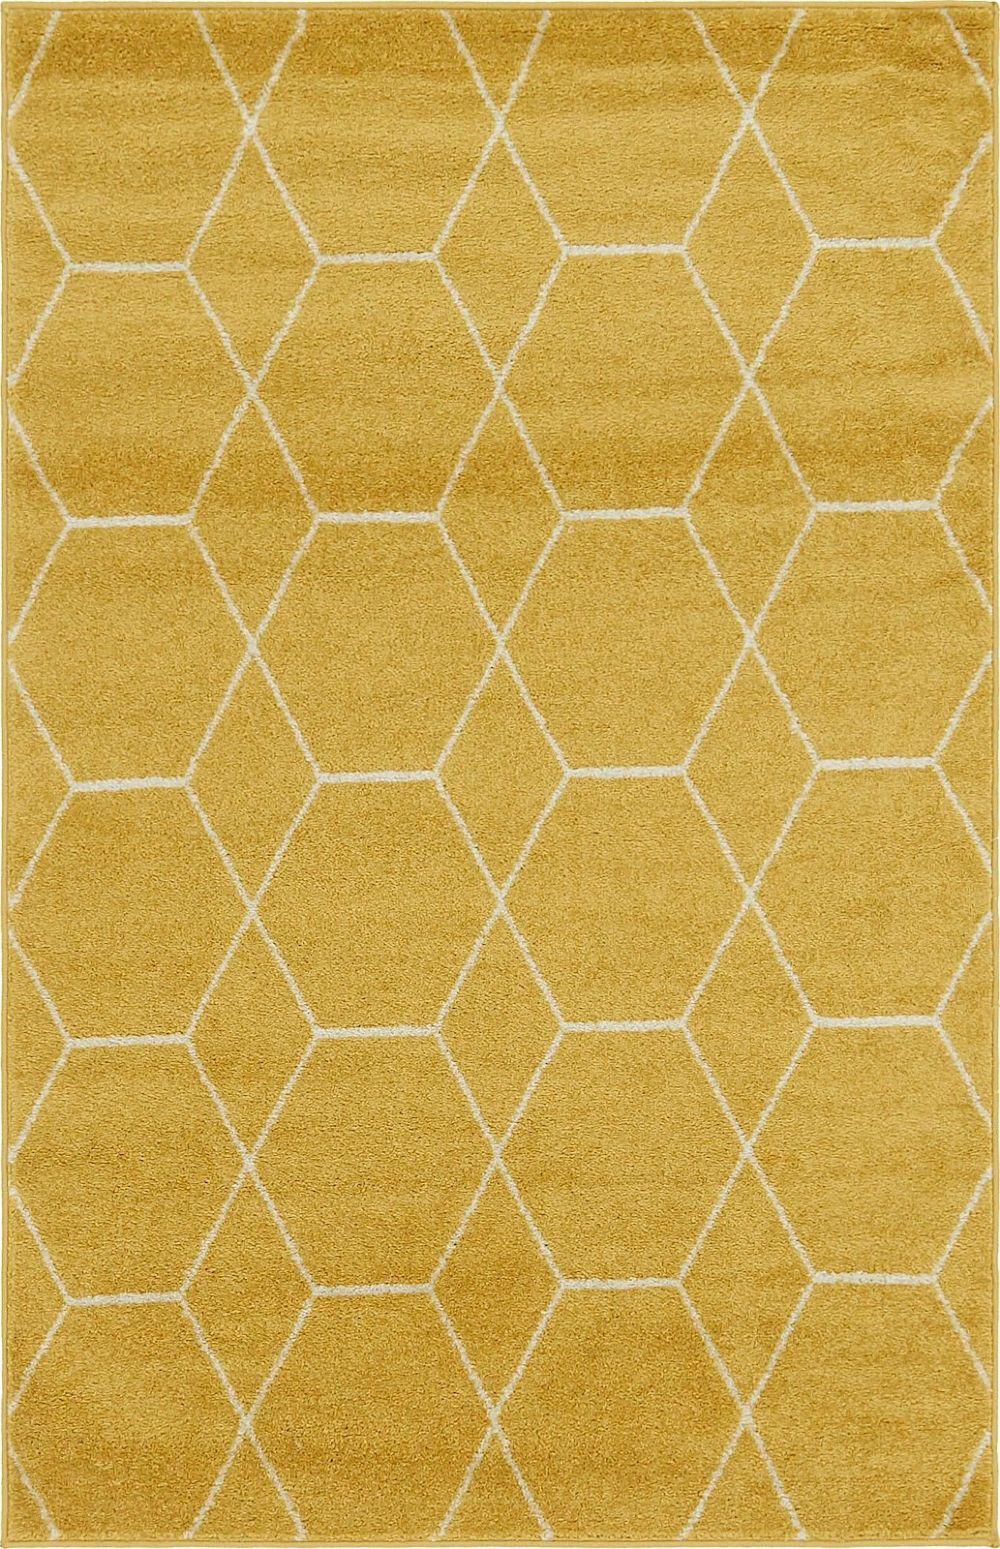 unique loom trellis frieze contemporary area rug collection